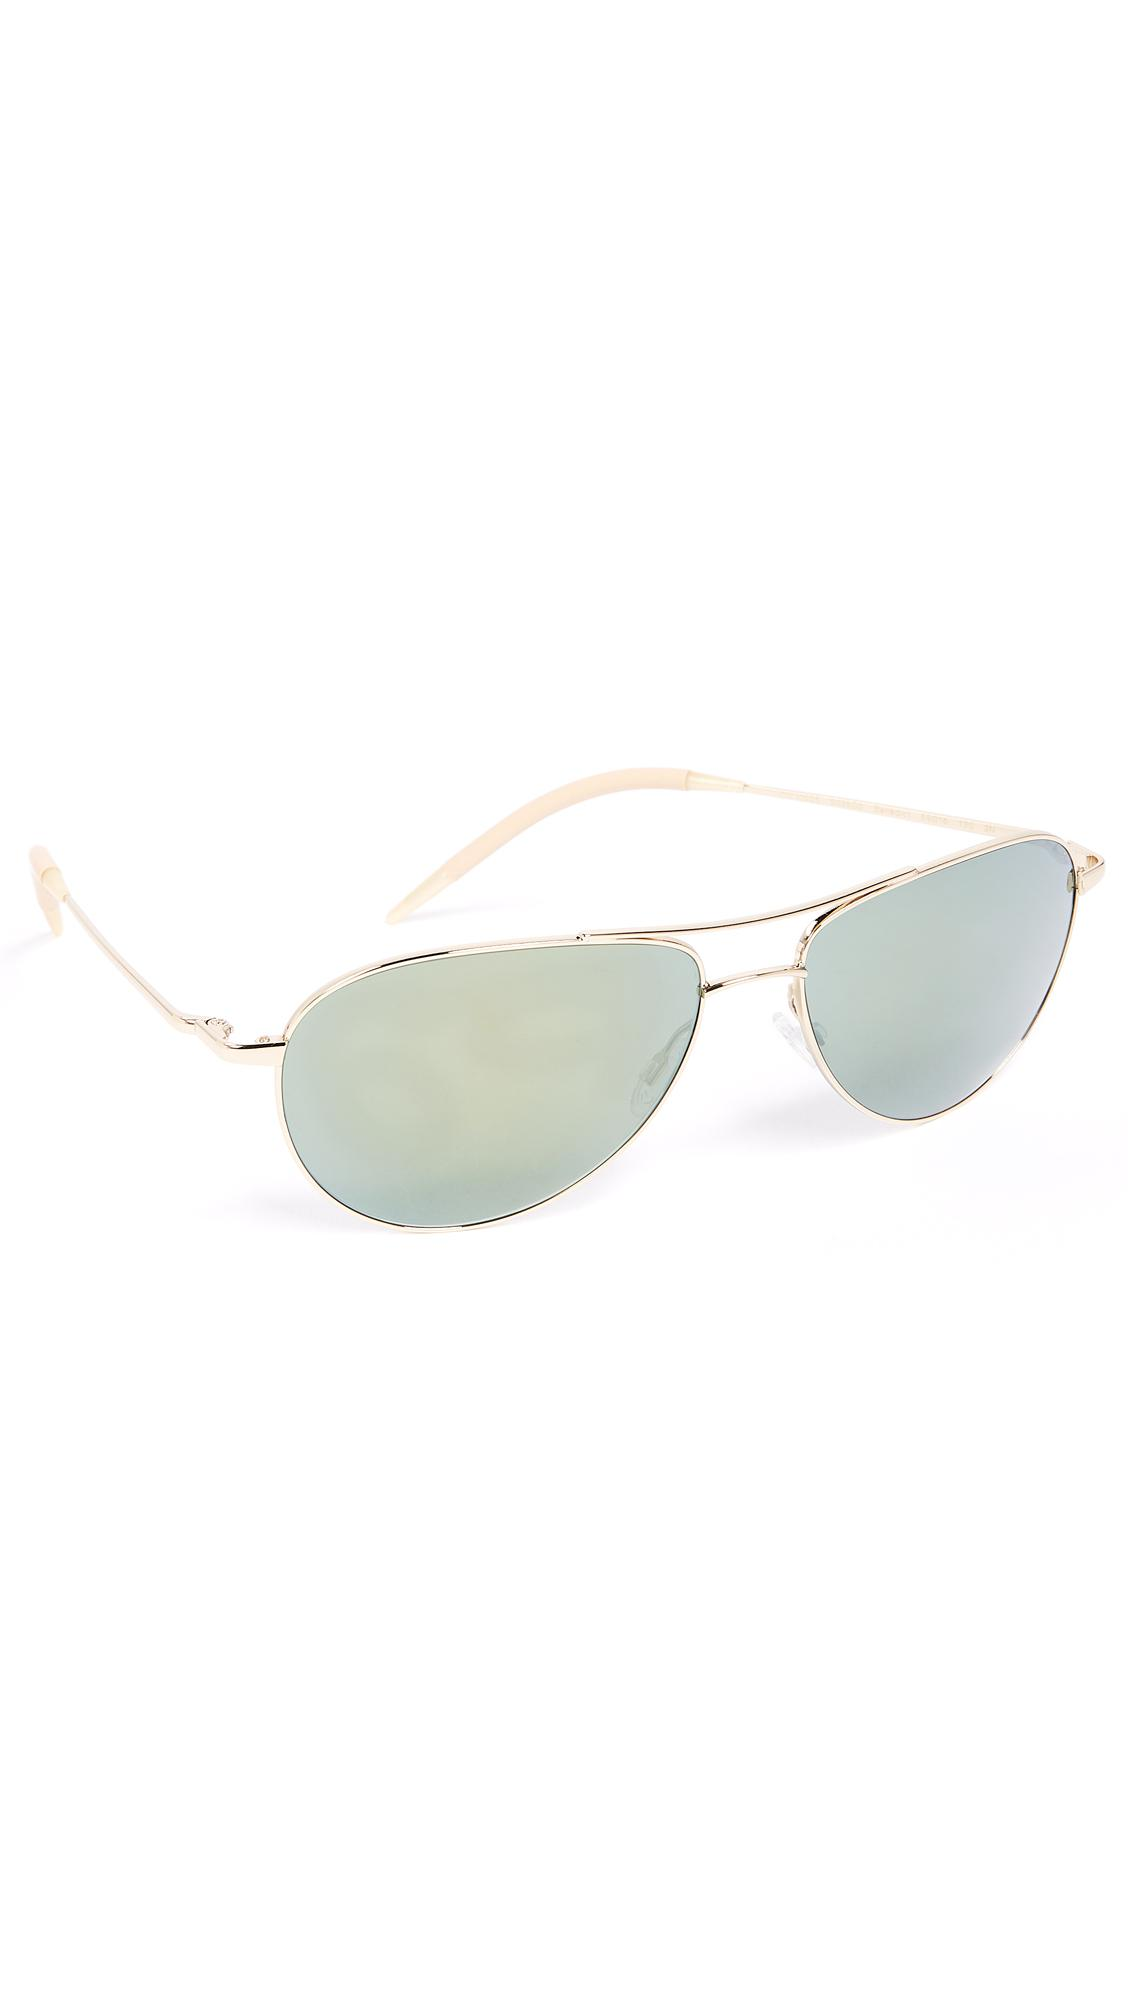 fd3009b22c Oliver Peoples Benedict Sunglasses in Metallic for Men - Lyst